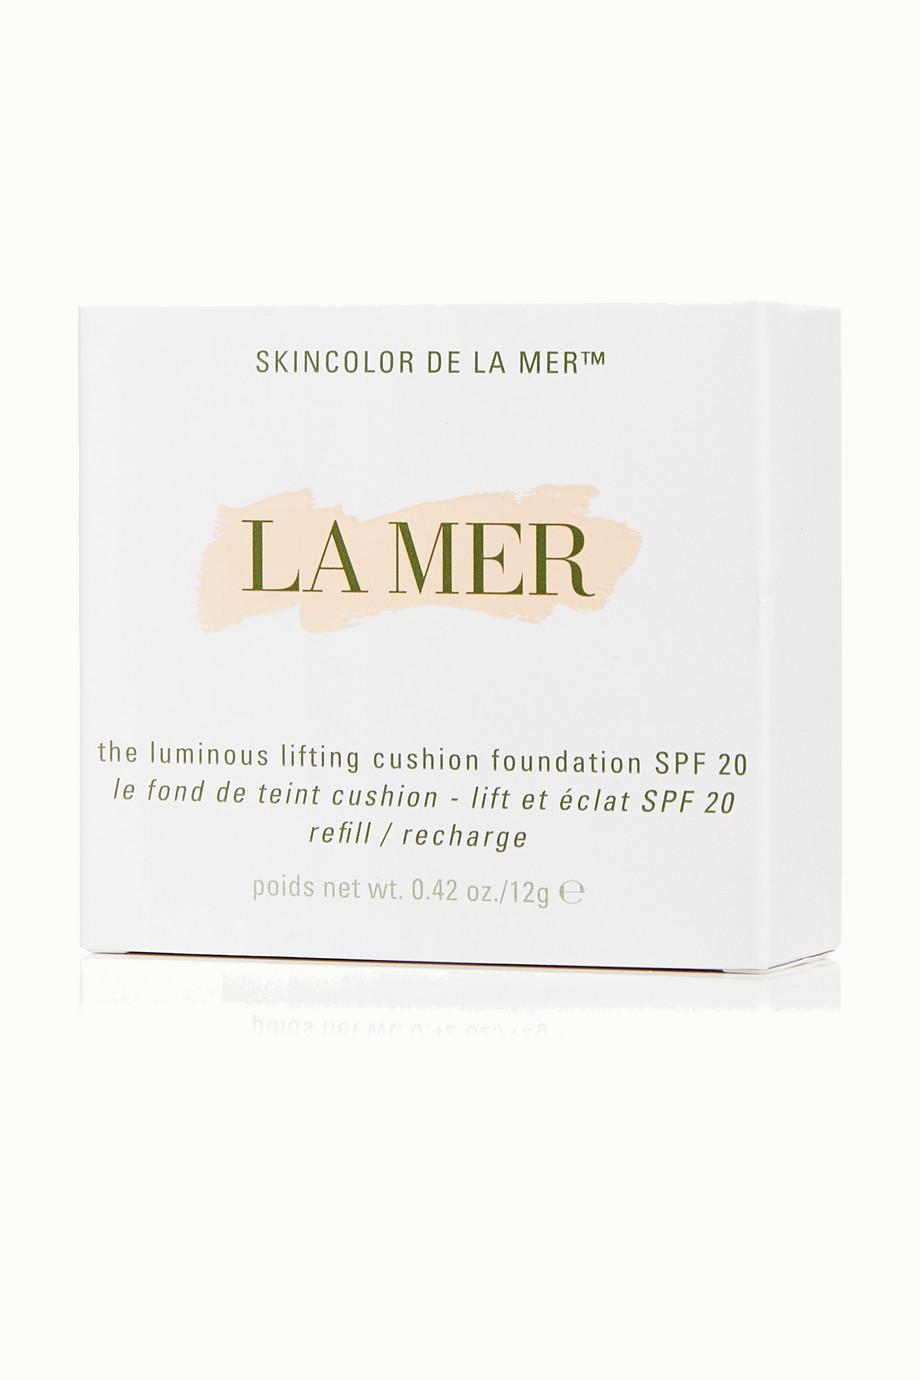 La Mer The Luminous Lifting Cushion Compact Foundation SPF20 Refill - 01 Pink Porcelain